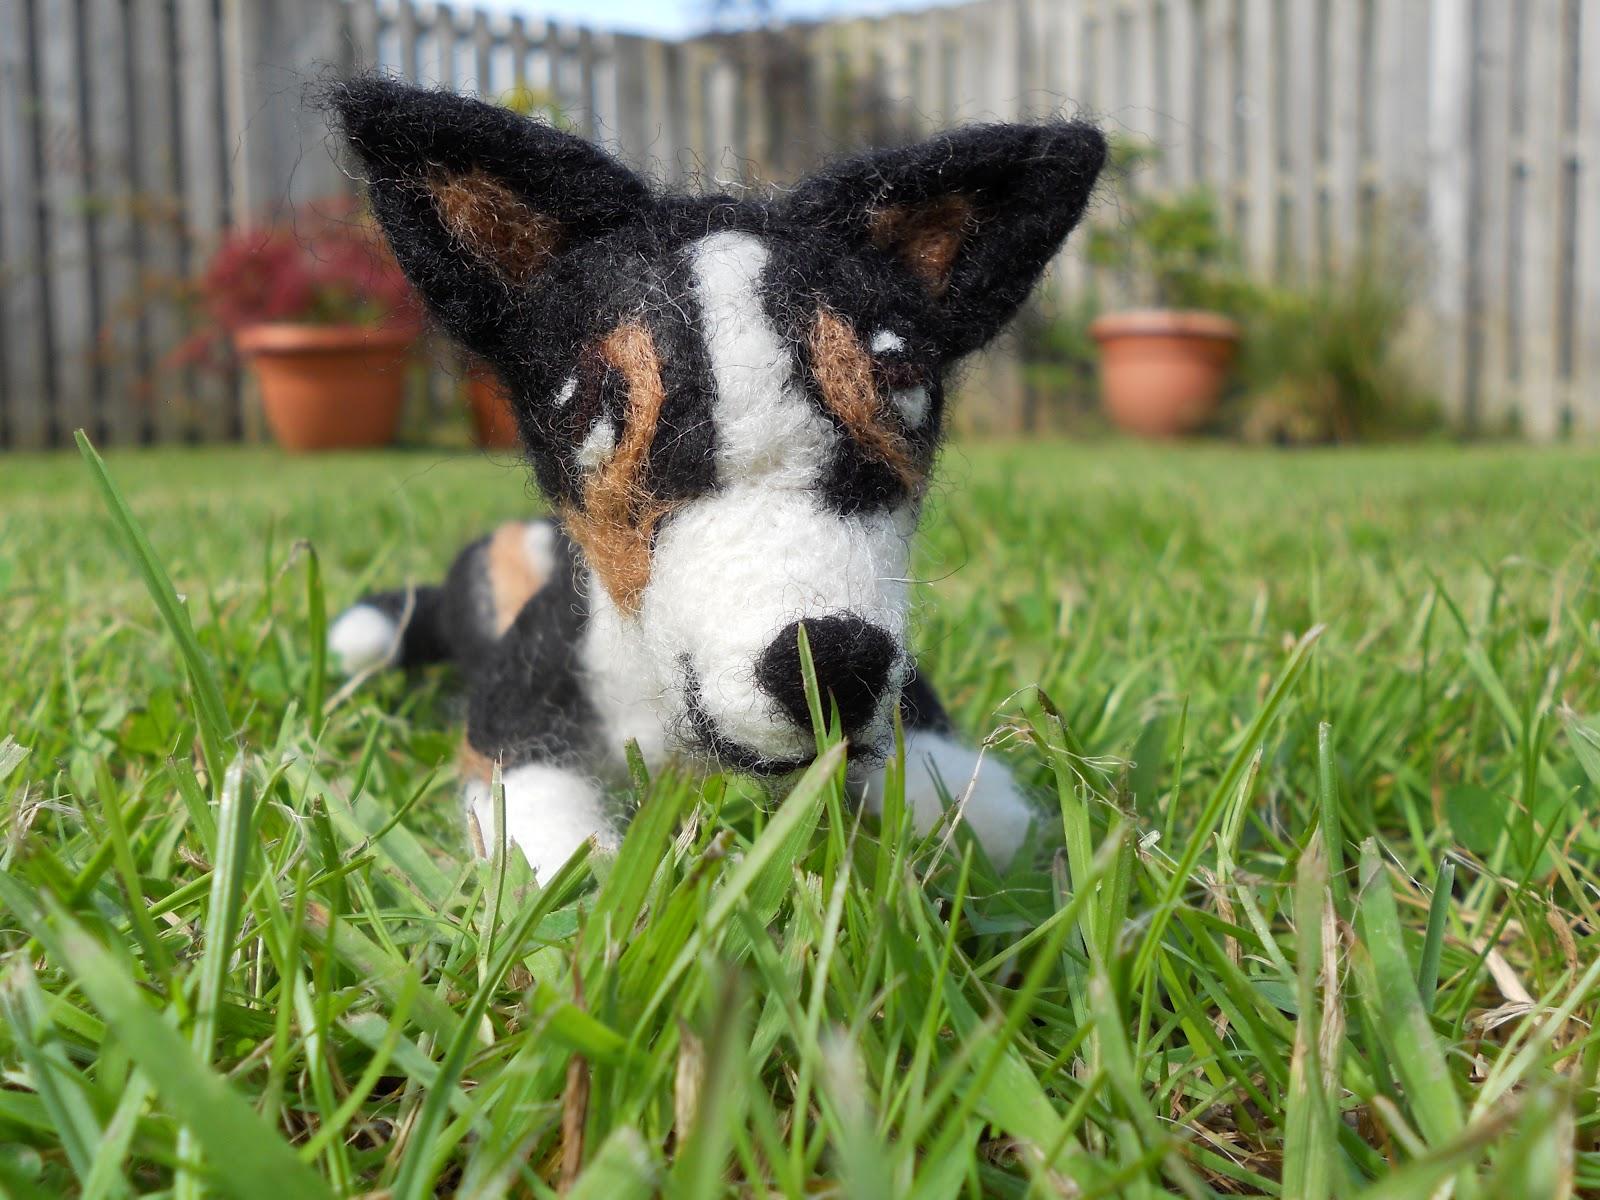 Ben Mcfuzzylugs : A-Z of dog breeds - Border Collie - photo#9